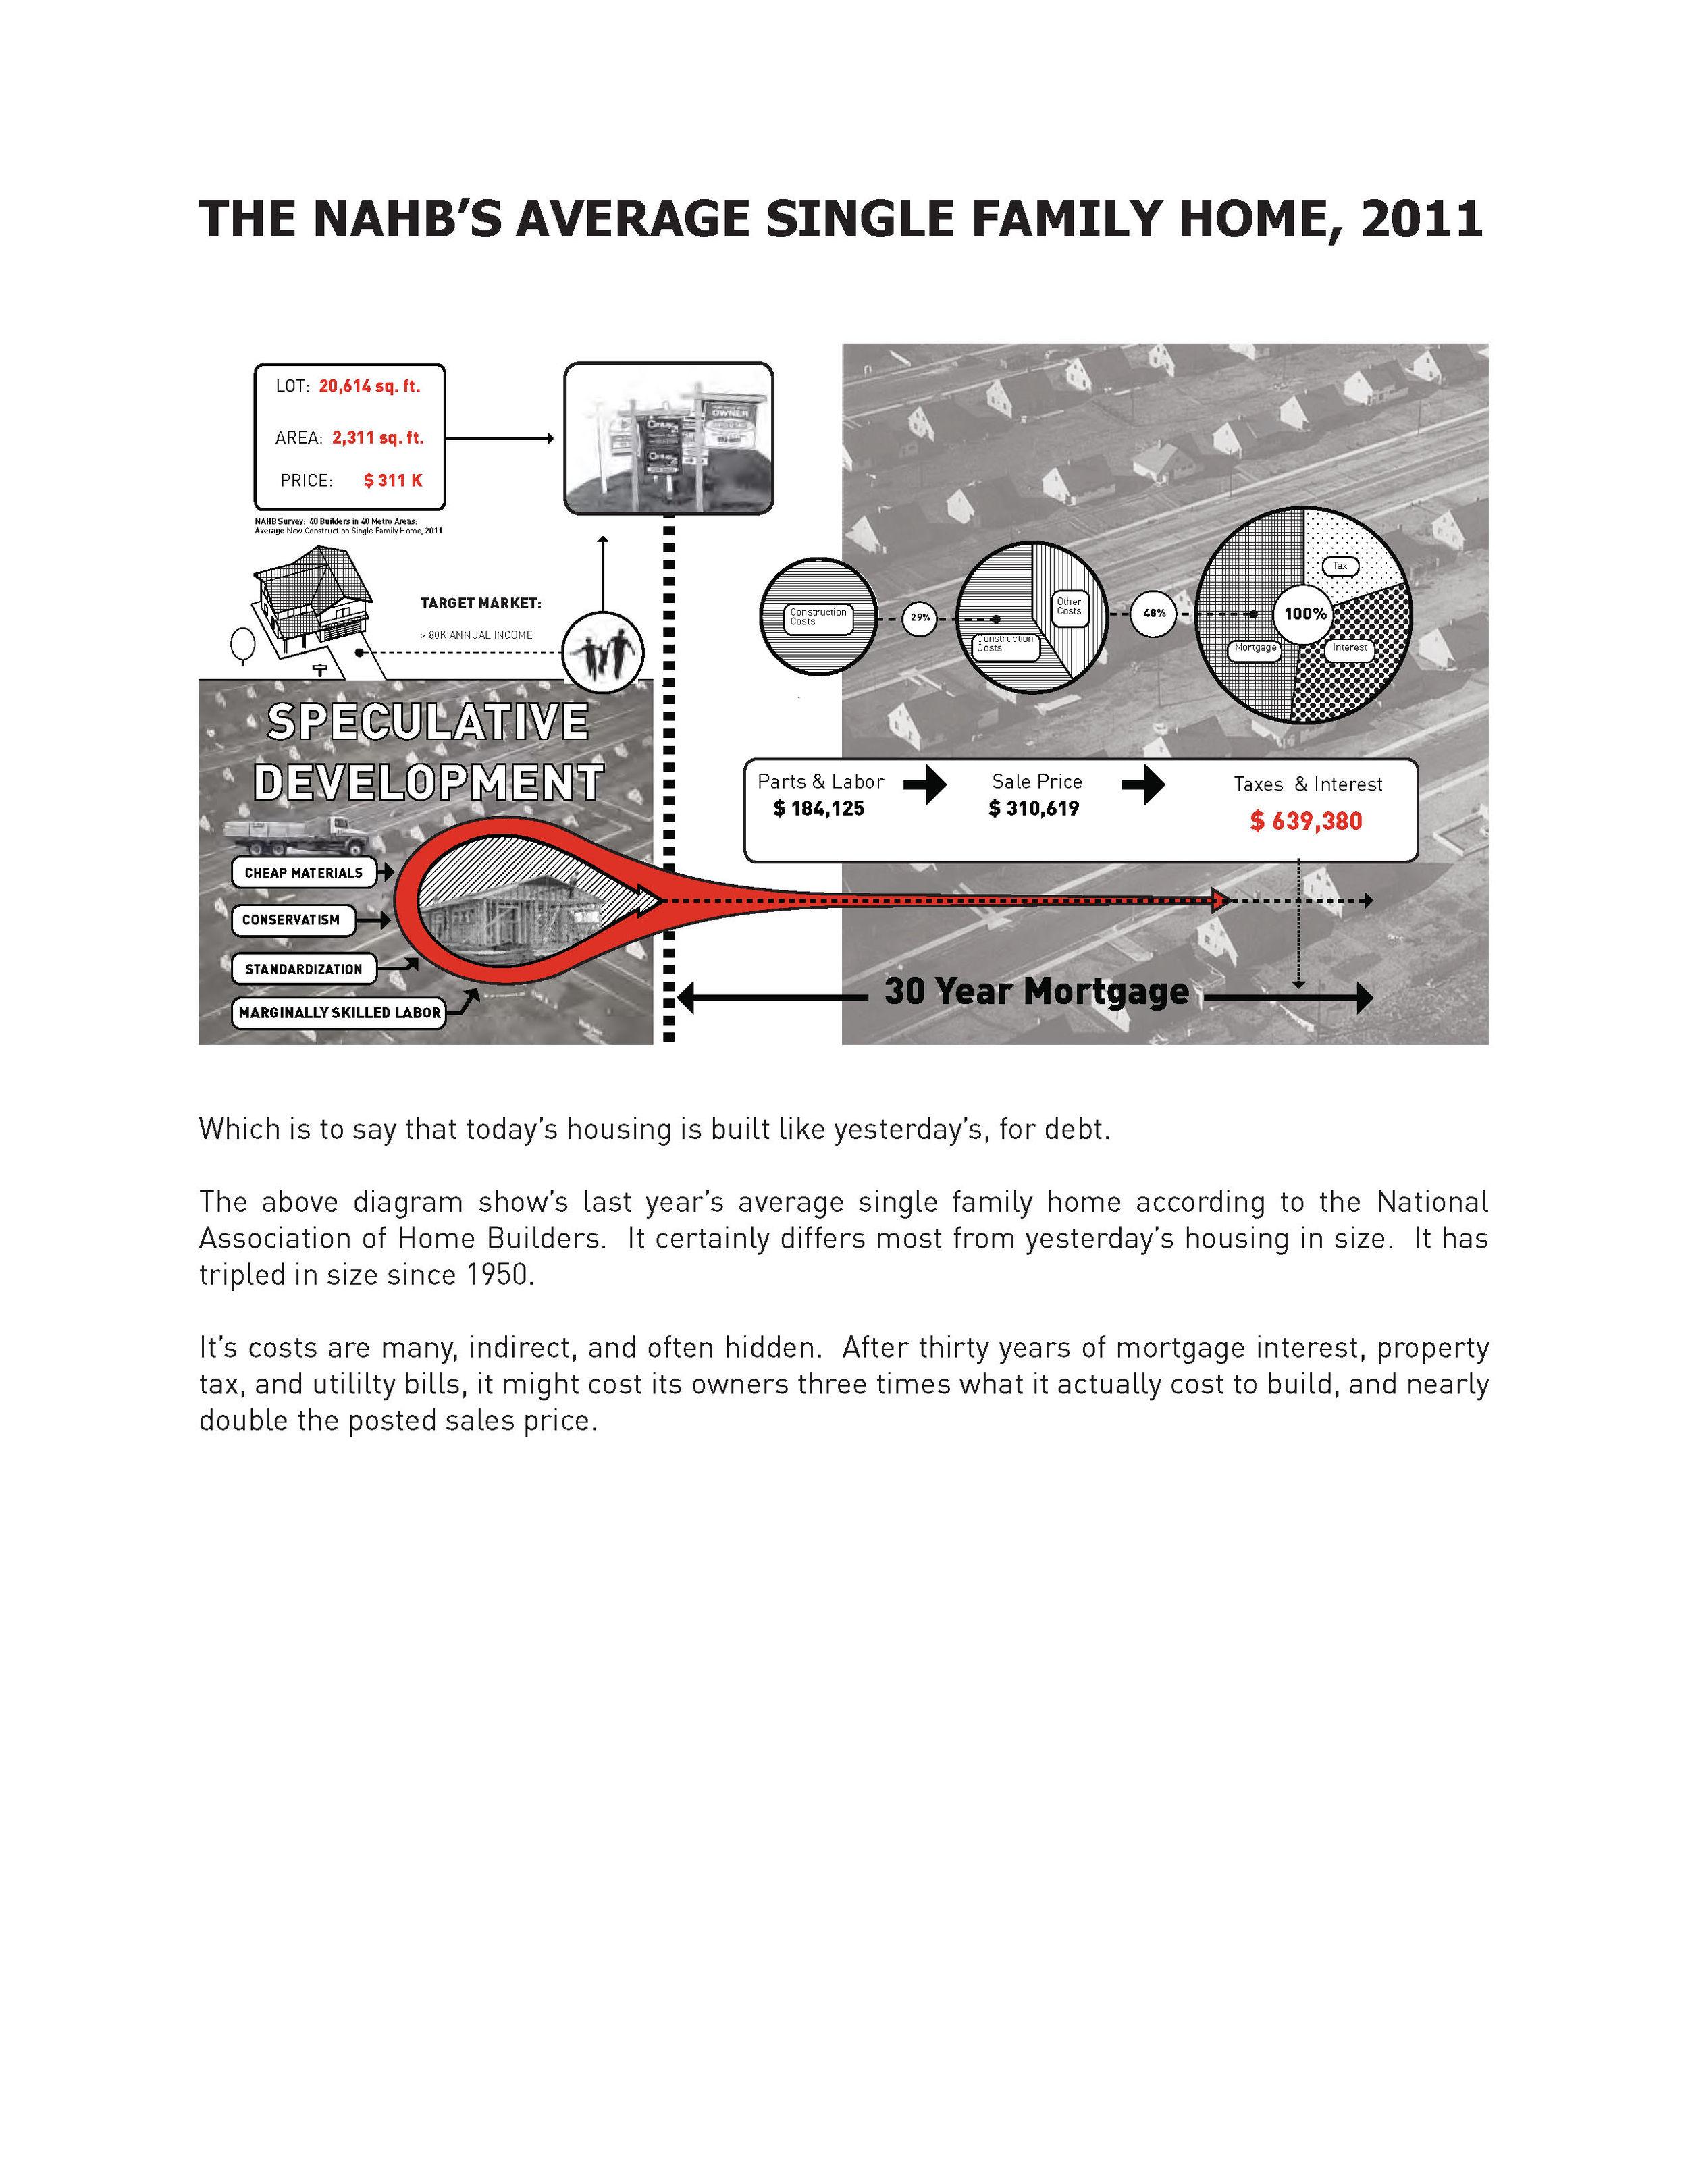 DSA_CMiller_Thesis_Slides_Boards_03_30_2013_Page_04.jpg